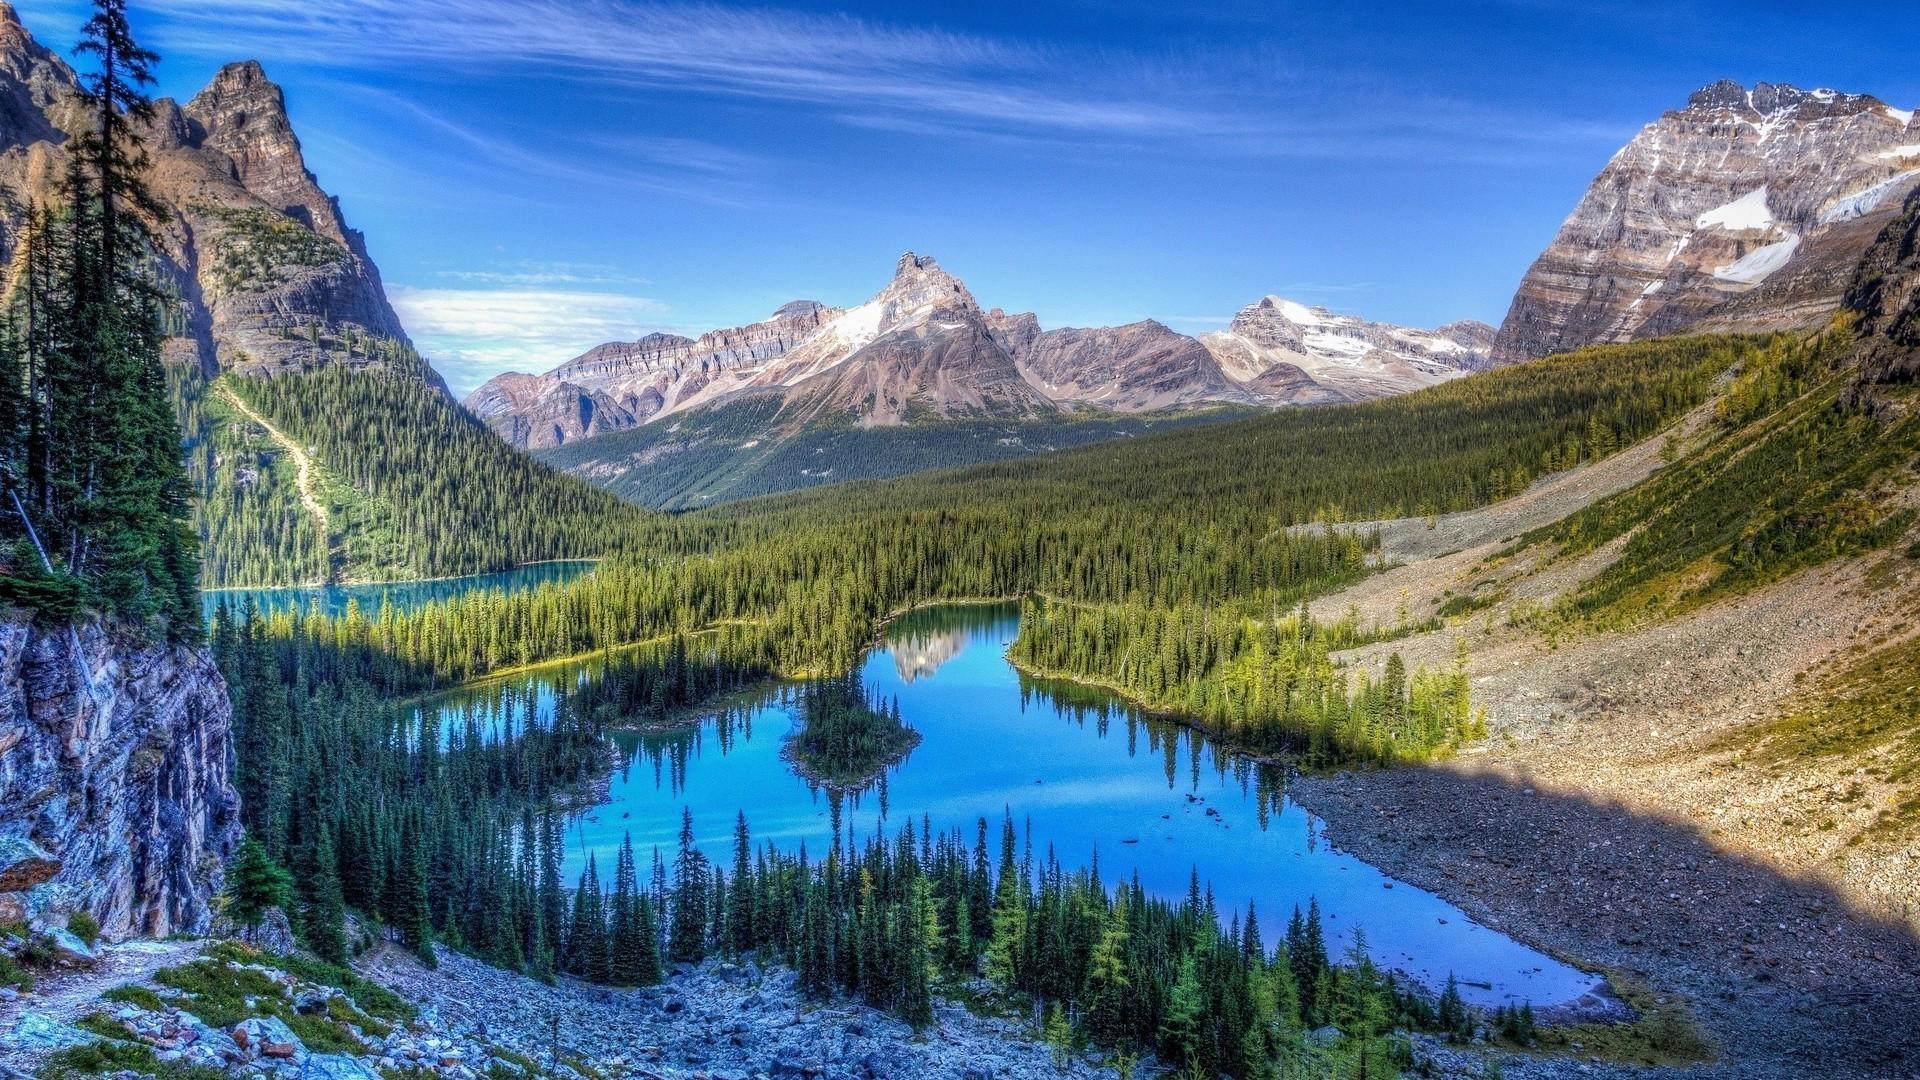 rocky mountain national park desktop wallpaper 1920x1080